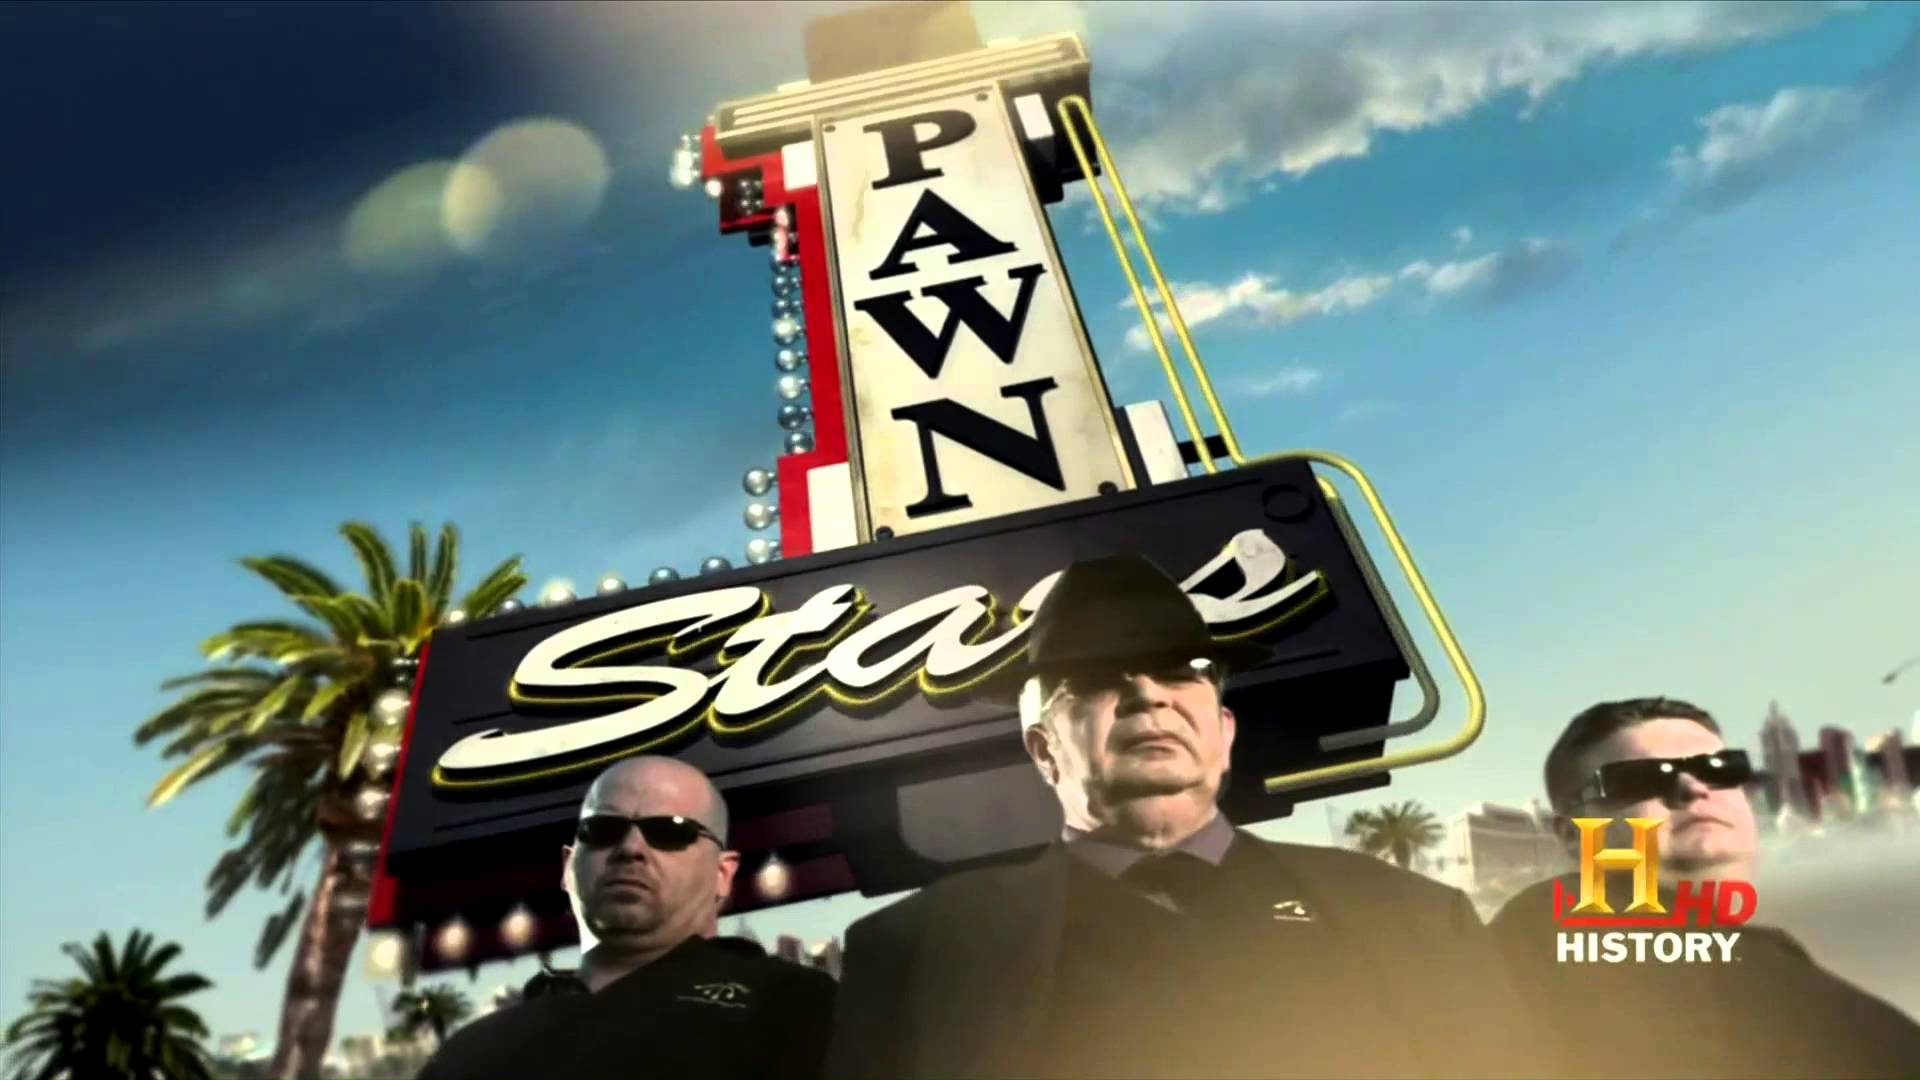 Pawn Stars Old & New Intro 1080p HD